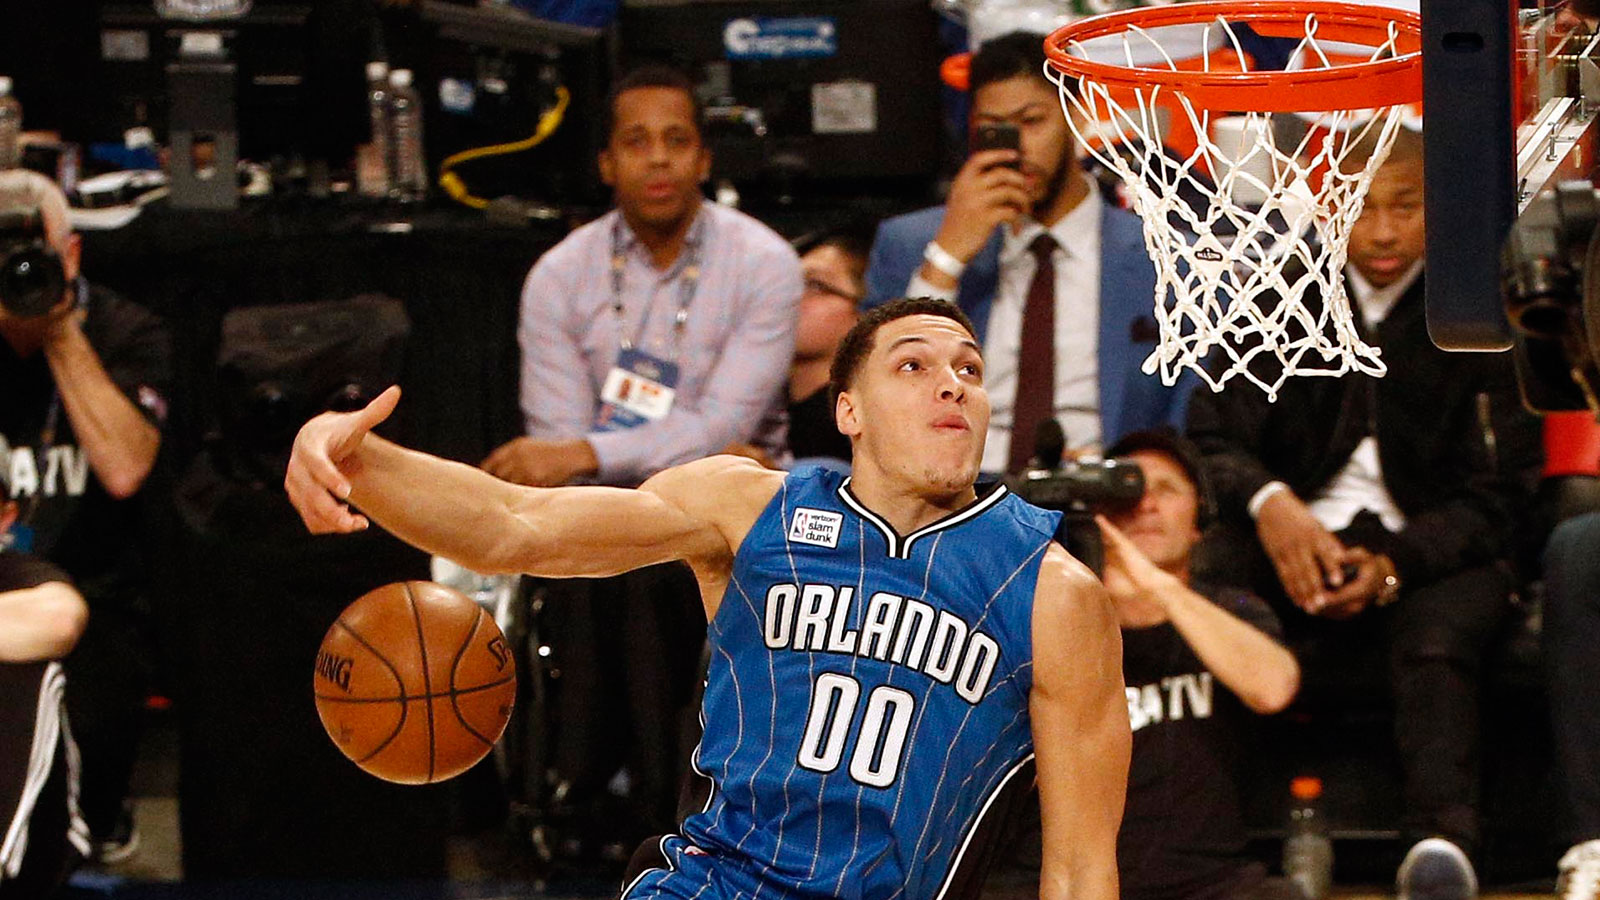 21817-NBA-Slam-Dunk-contest-PI2-AV